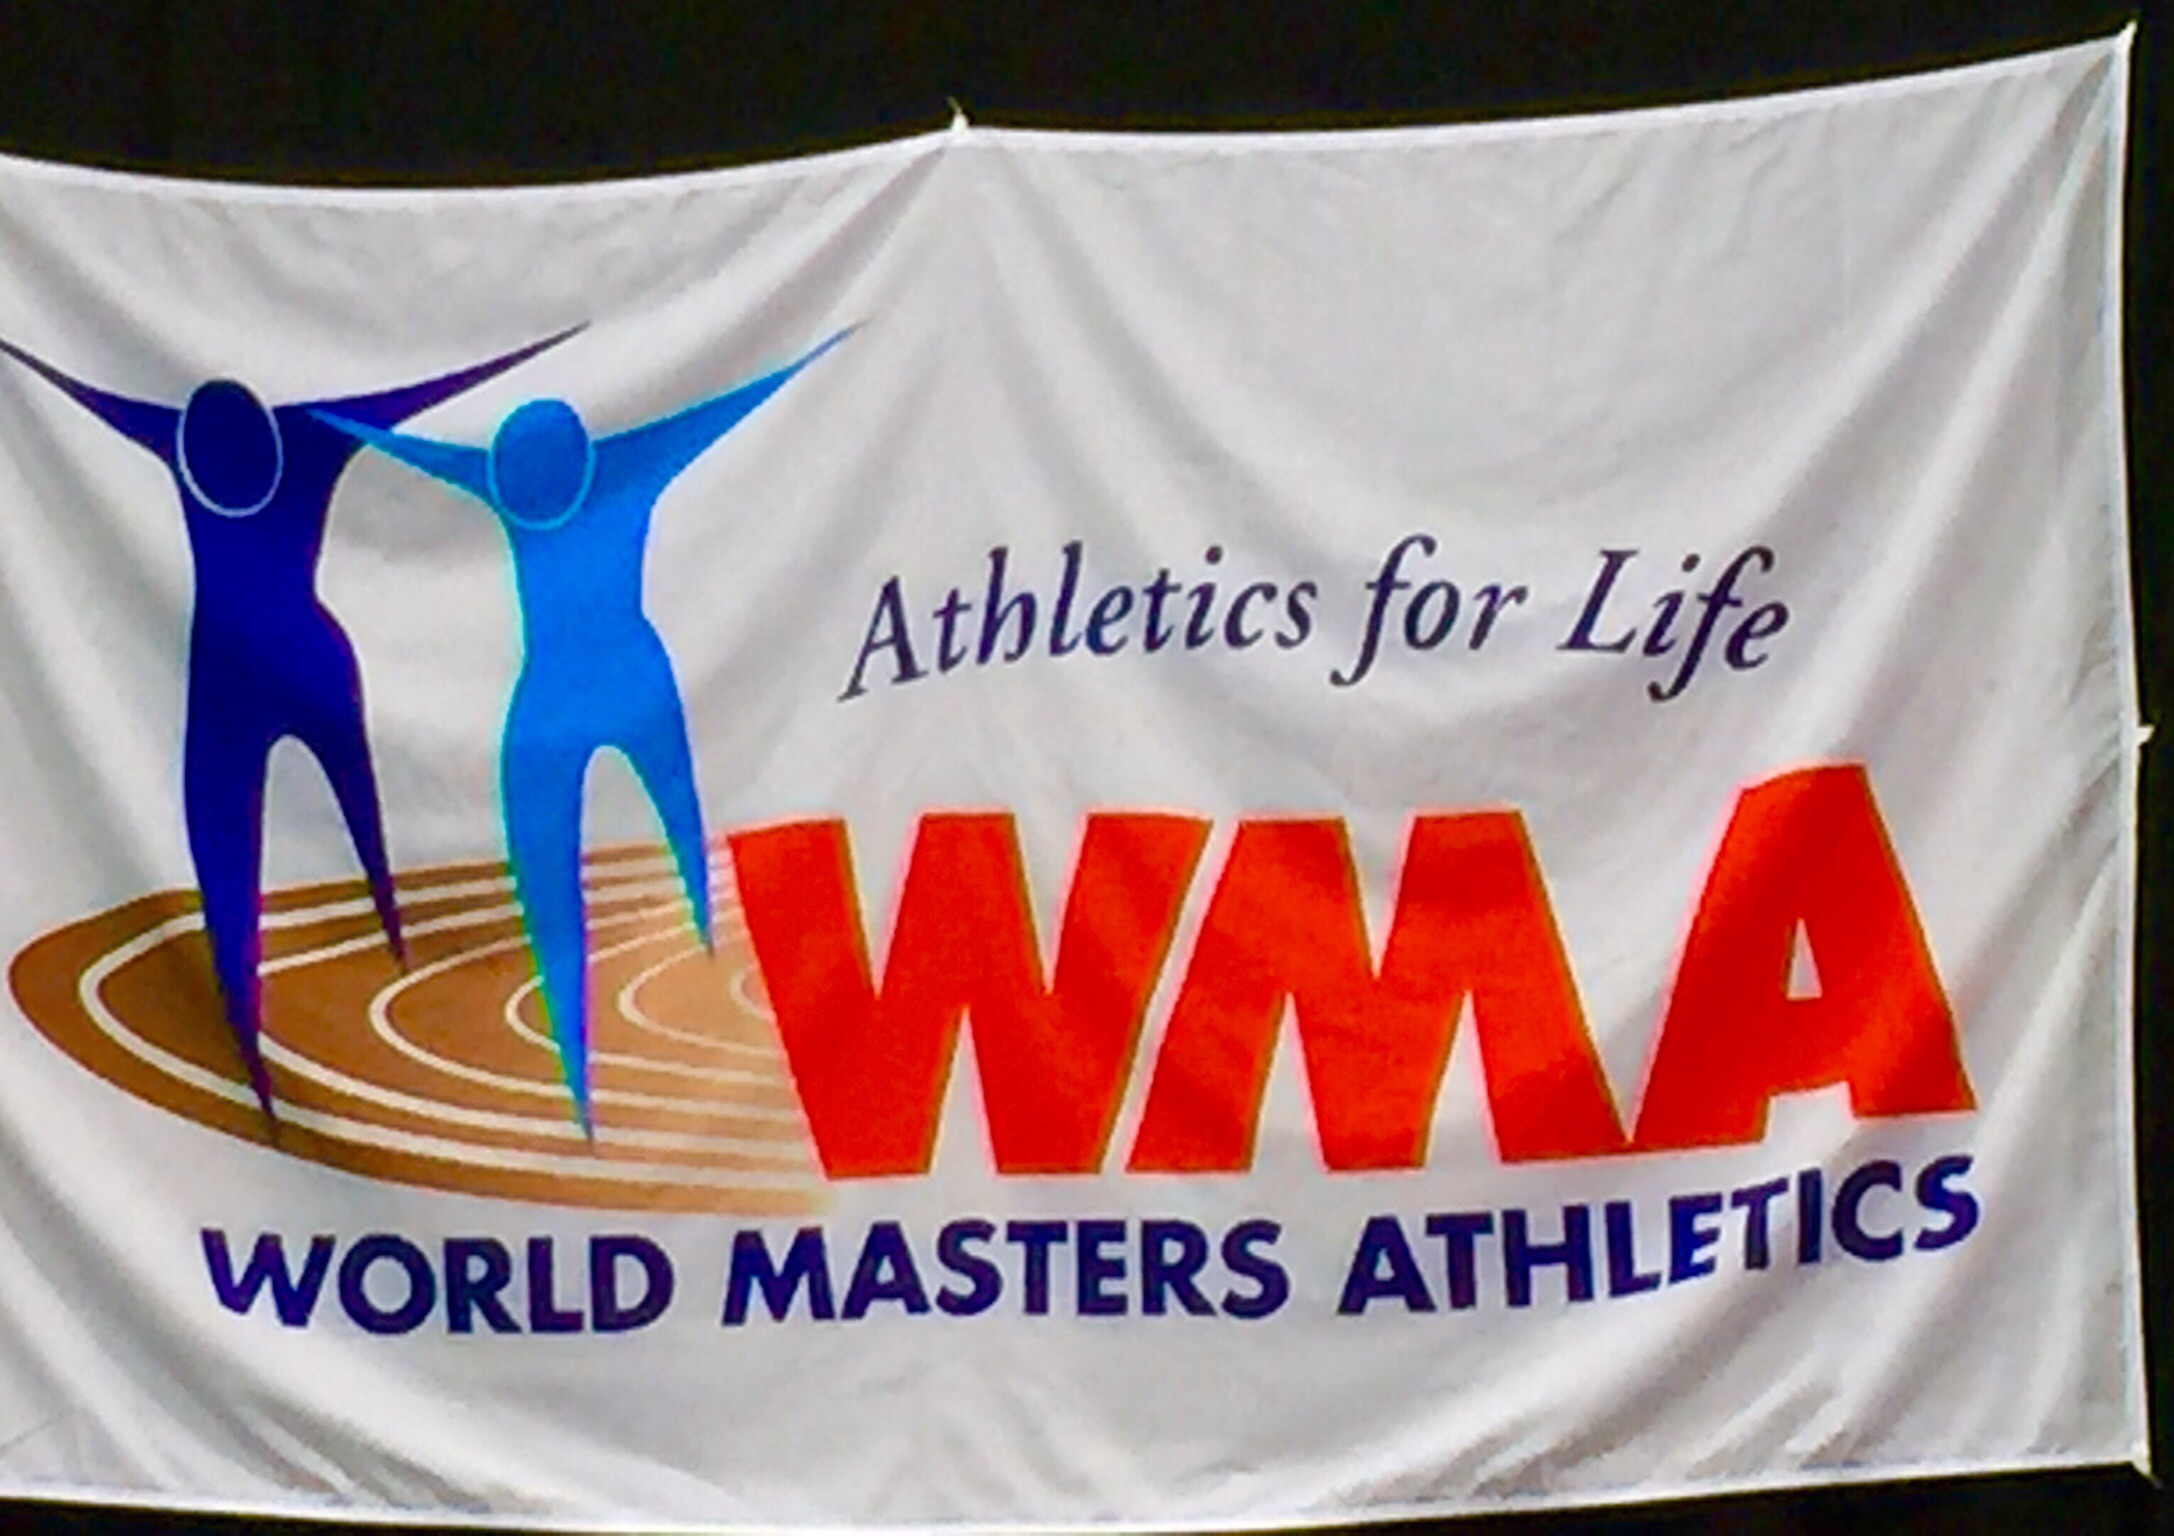 World Master Athletics flag at the awards arena